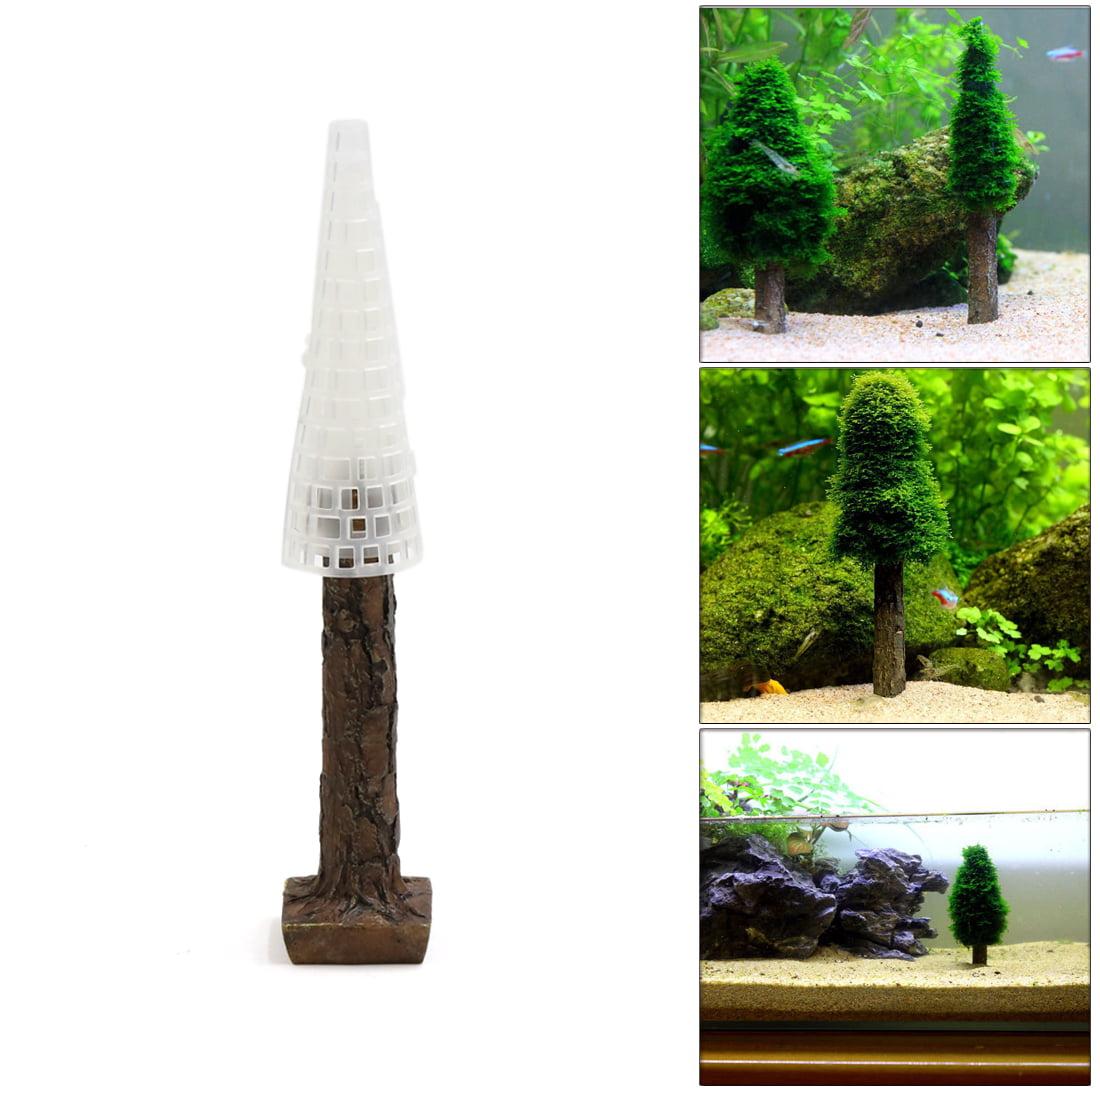 Christmas Tree Moss Aquarium: 1Pcs Plastic Moss Christmas Tree Trunk Aquascape Ornament